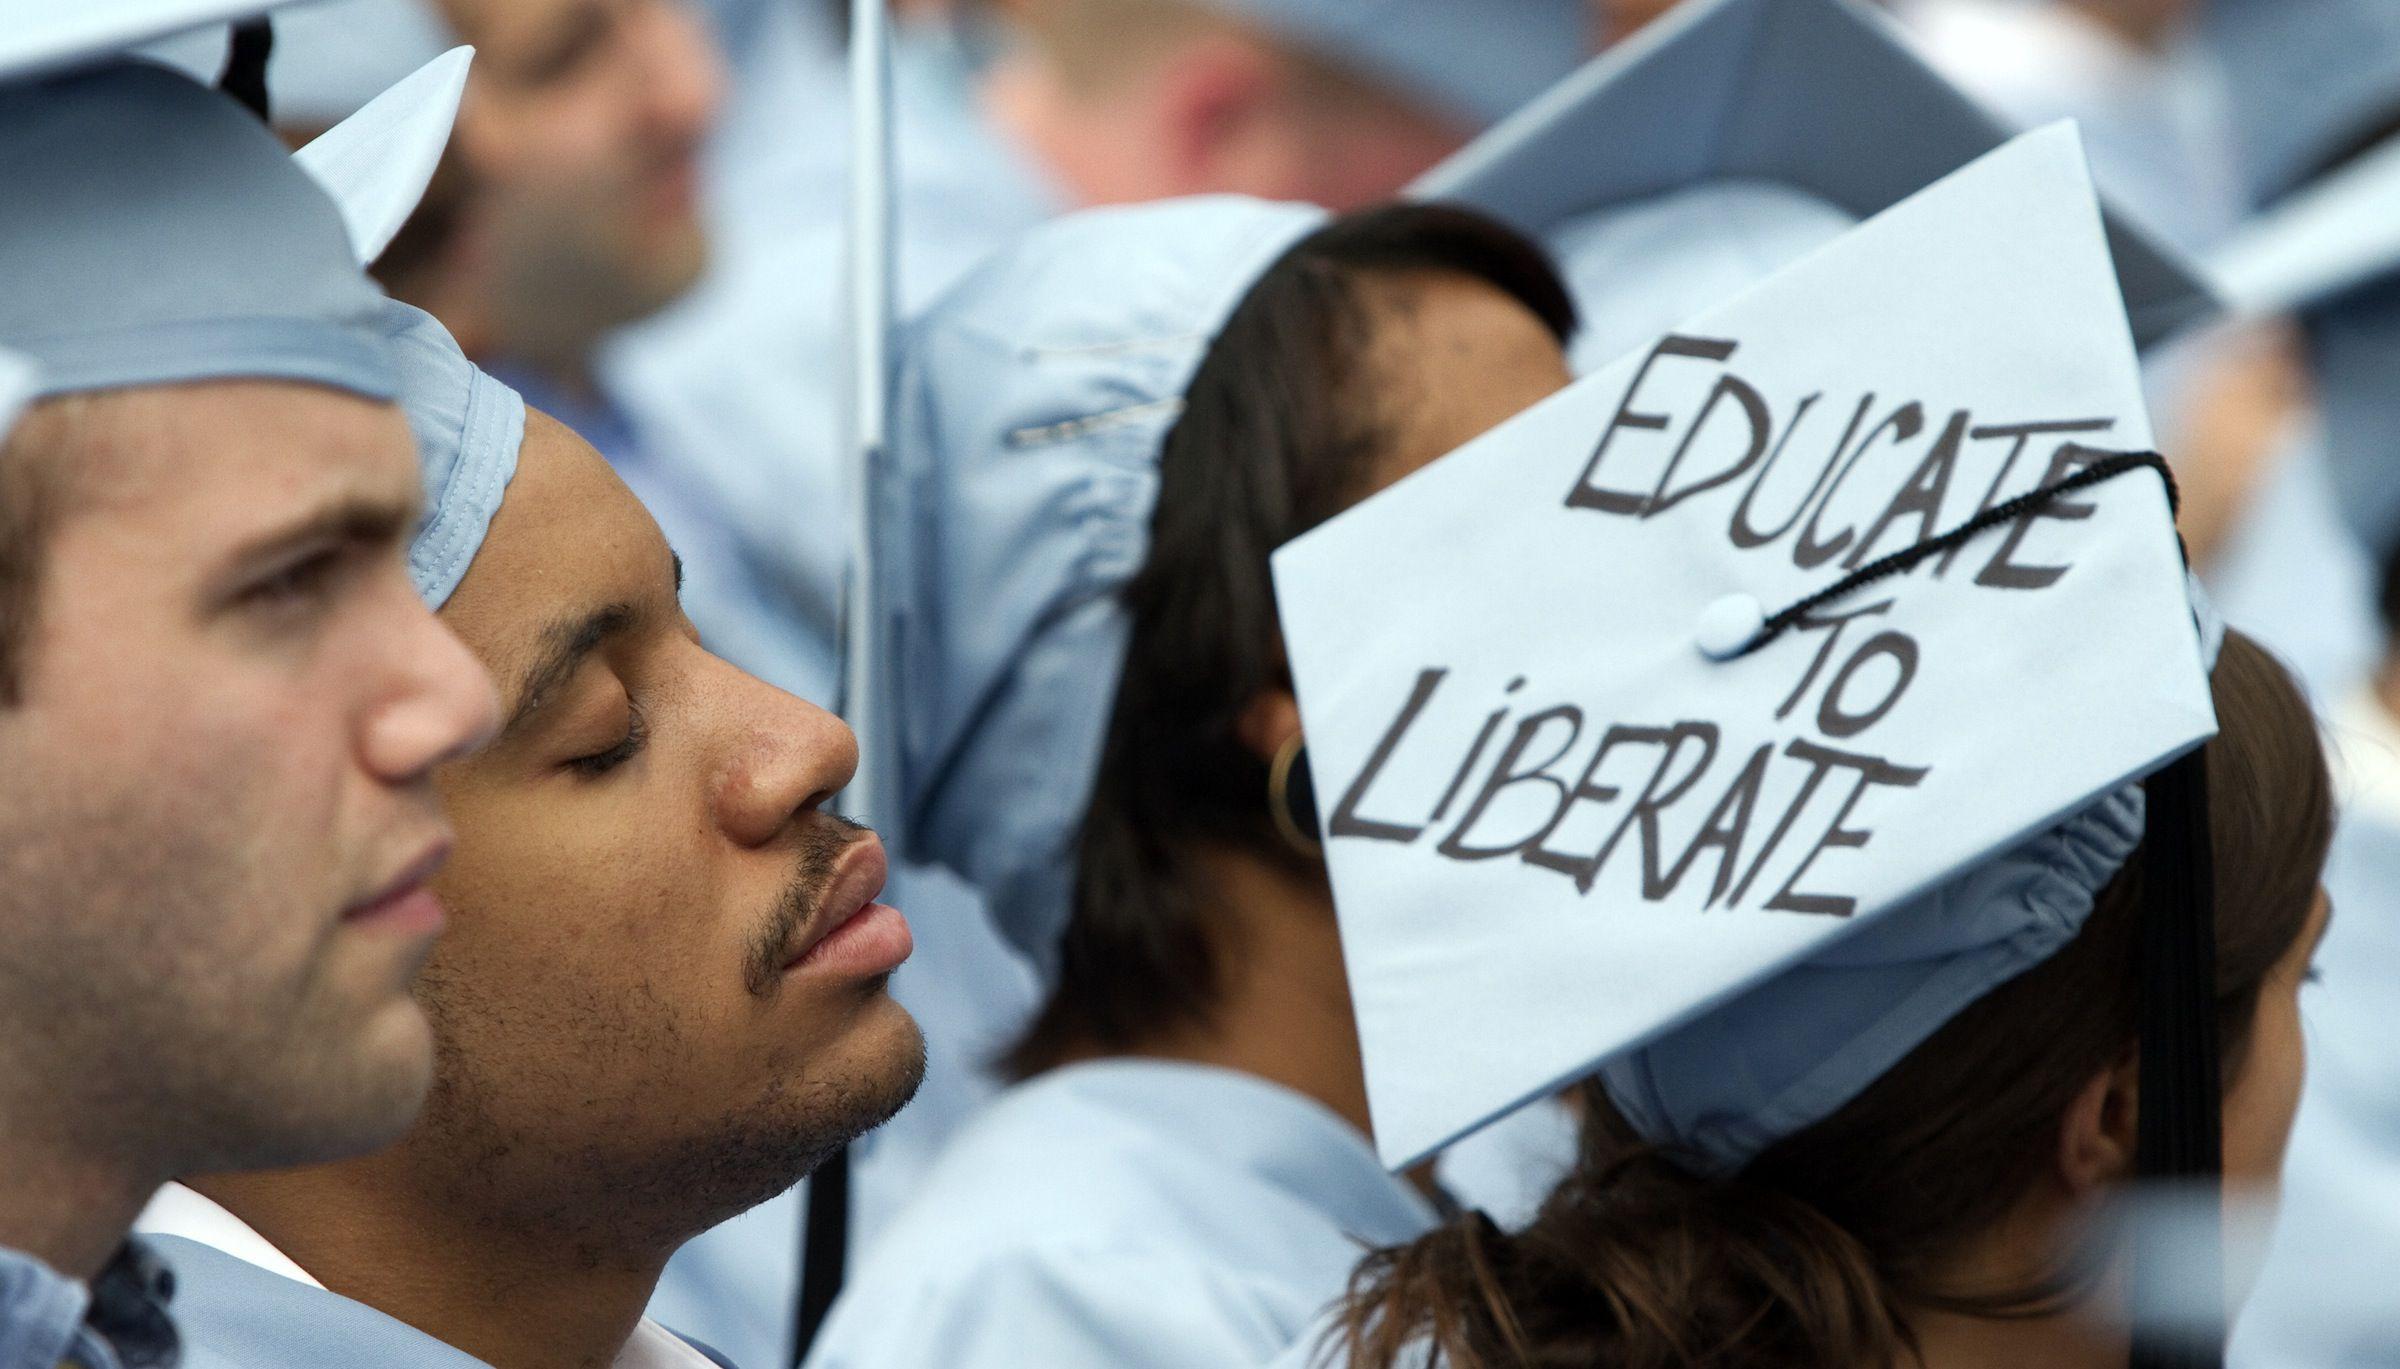 Columbia Univeristy graduation